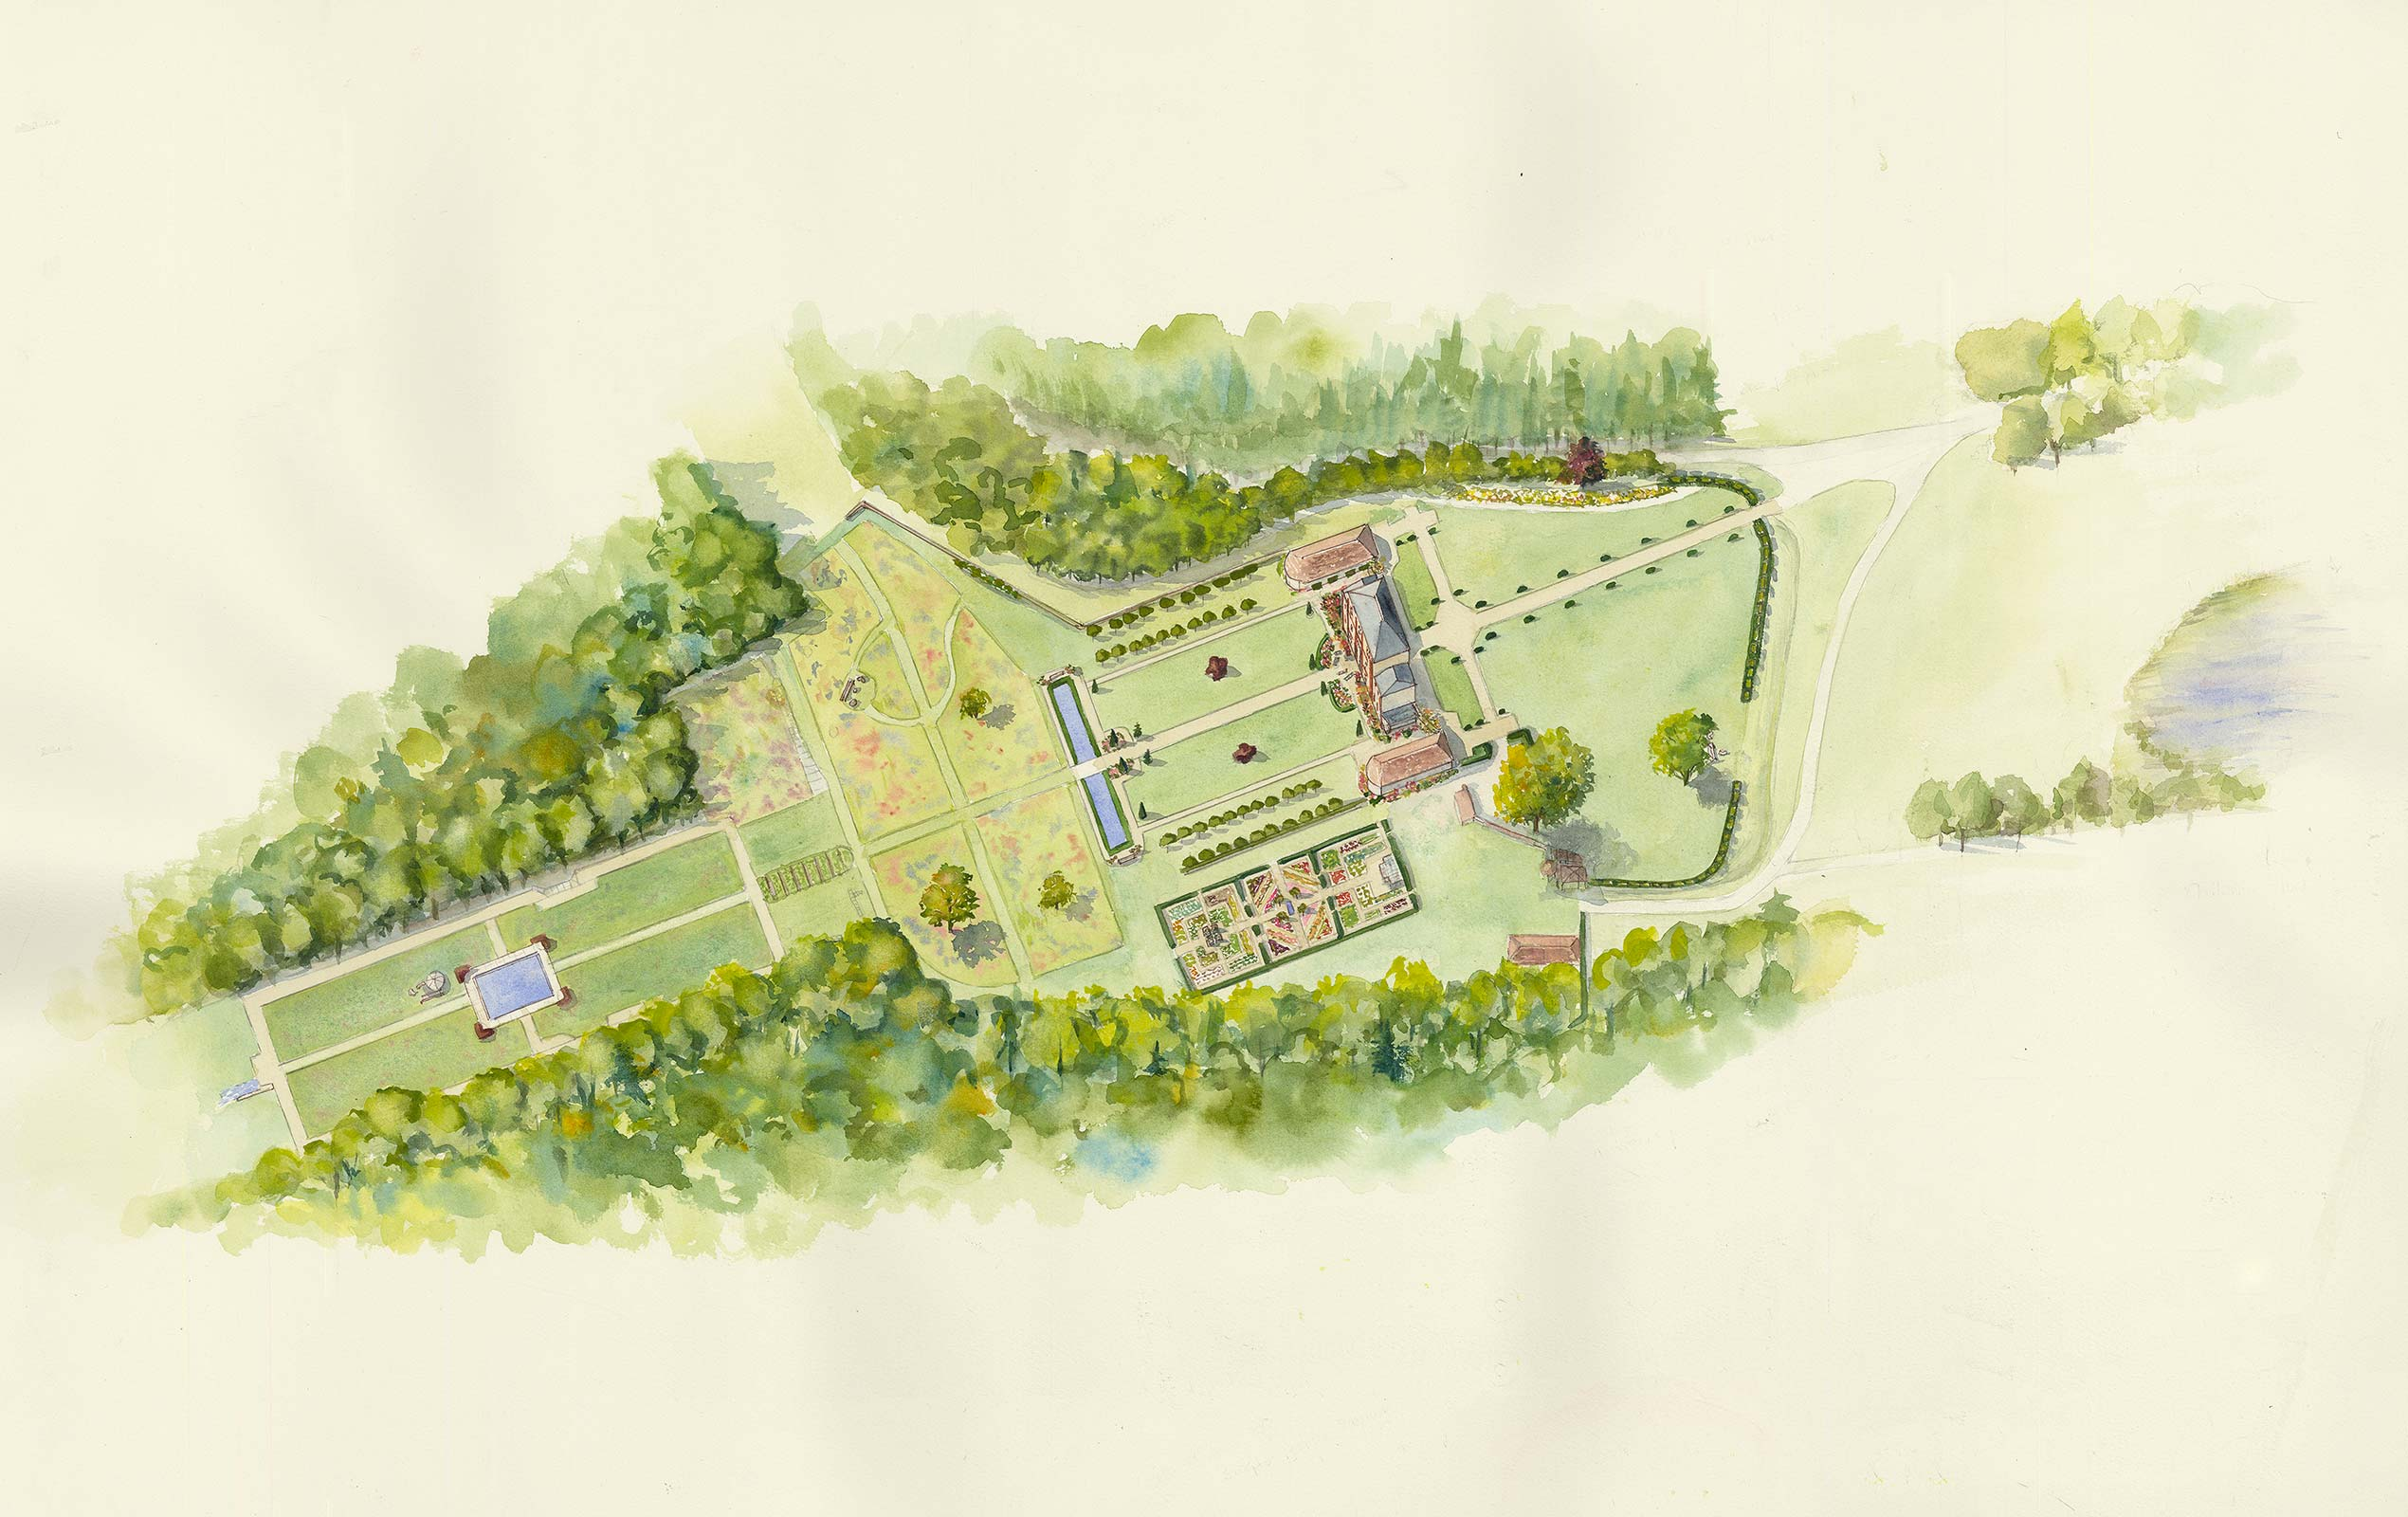 Illustration of proposed historical garden restoration In Normandy, France